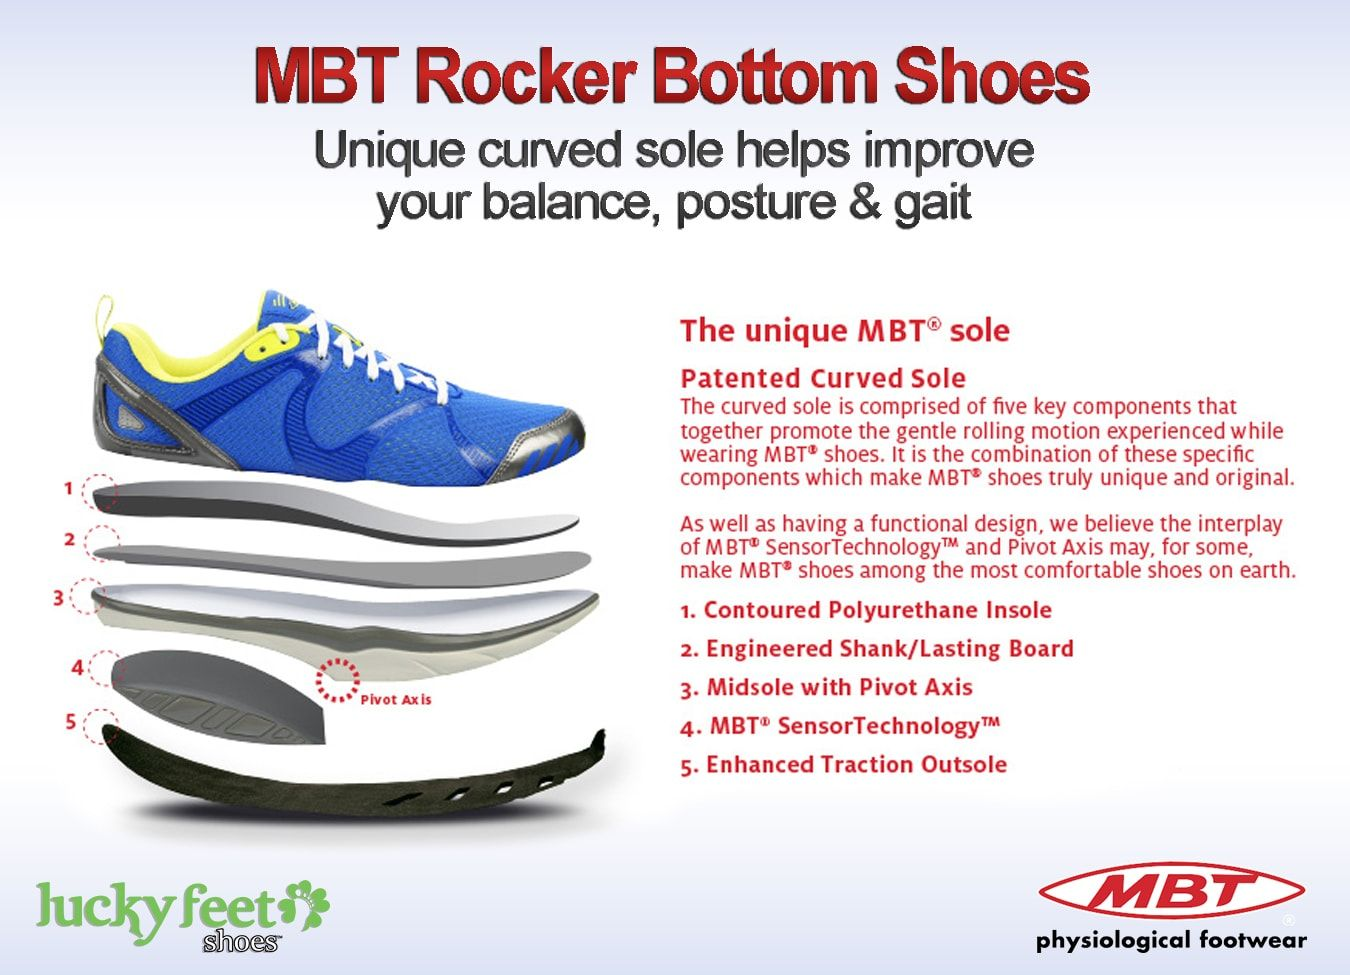 MBT Rocker Bottom Shoes - Colorado 17 and Simba 17  http://luckyfeetshoes.com/mbt-rocker-bottom-shoes-spring-2017/